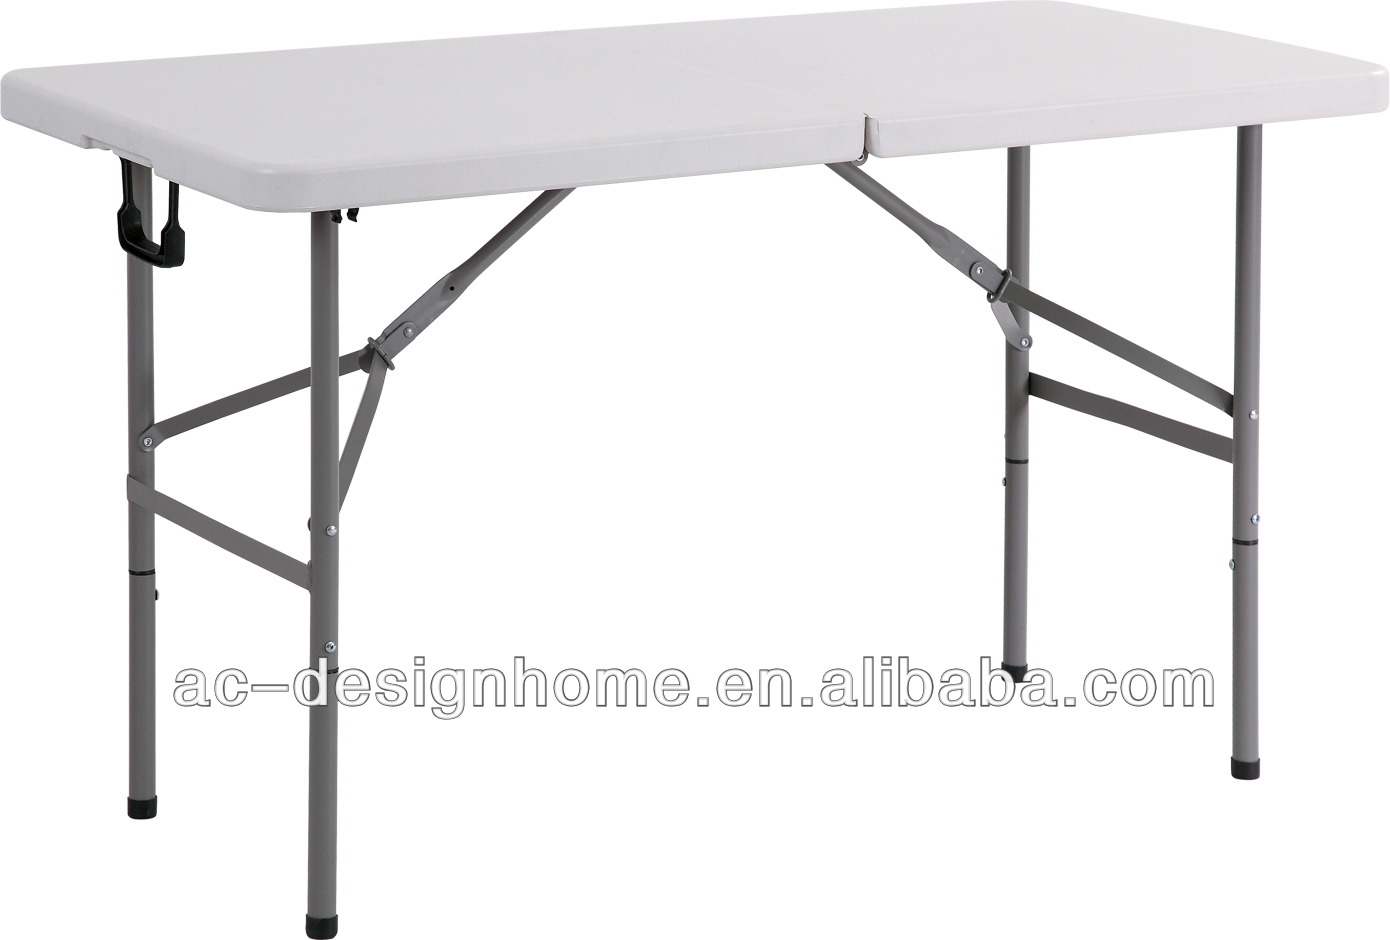 plastic folding table plastic folding table suppliers and at alibabacom - Plastic Folding Tables